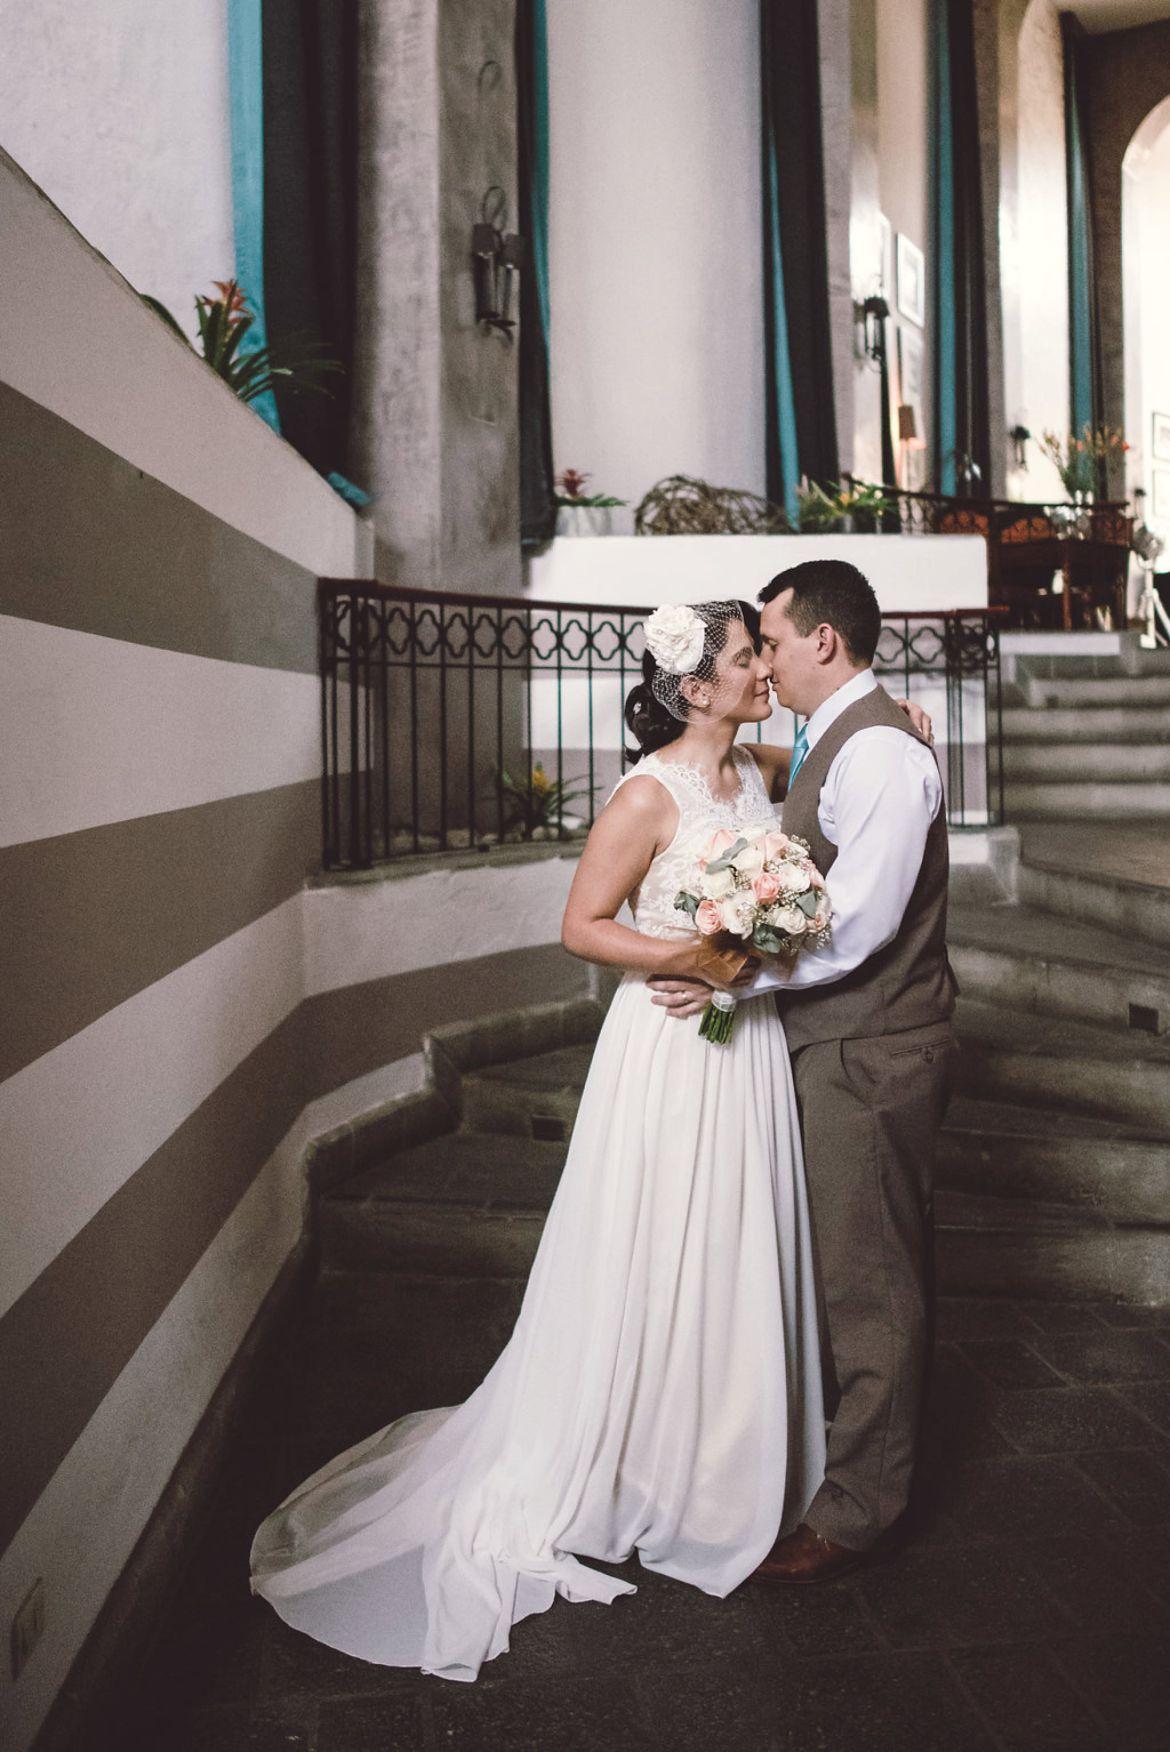 Costa_Rica_wedding_photography_0010.jpg